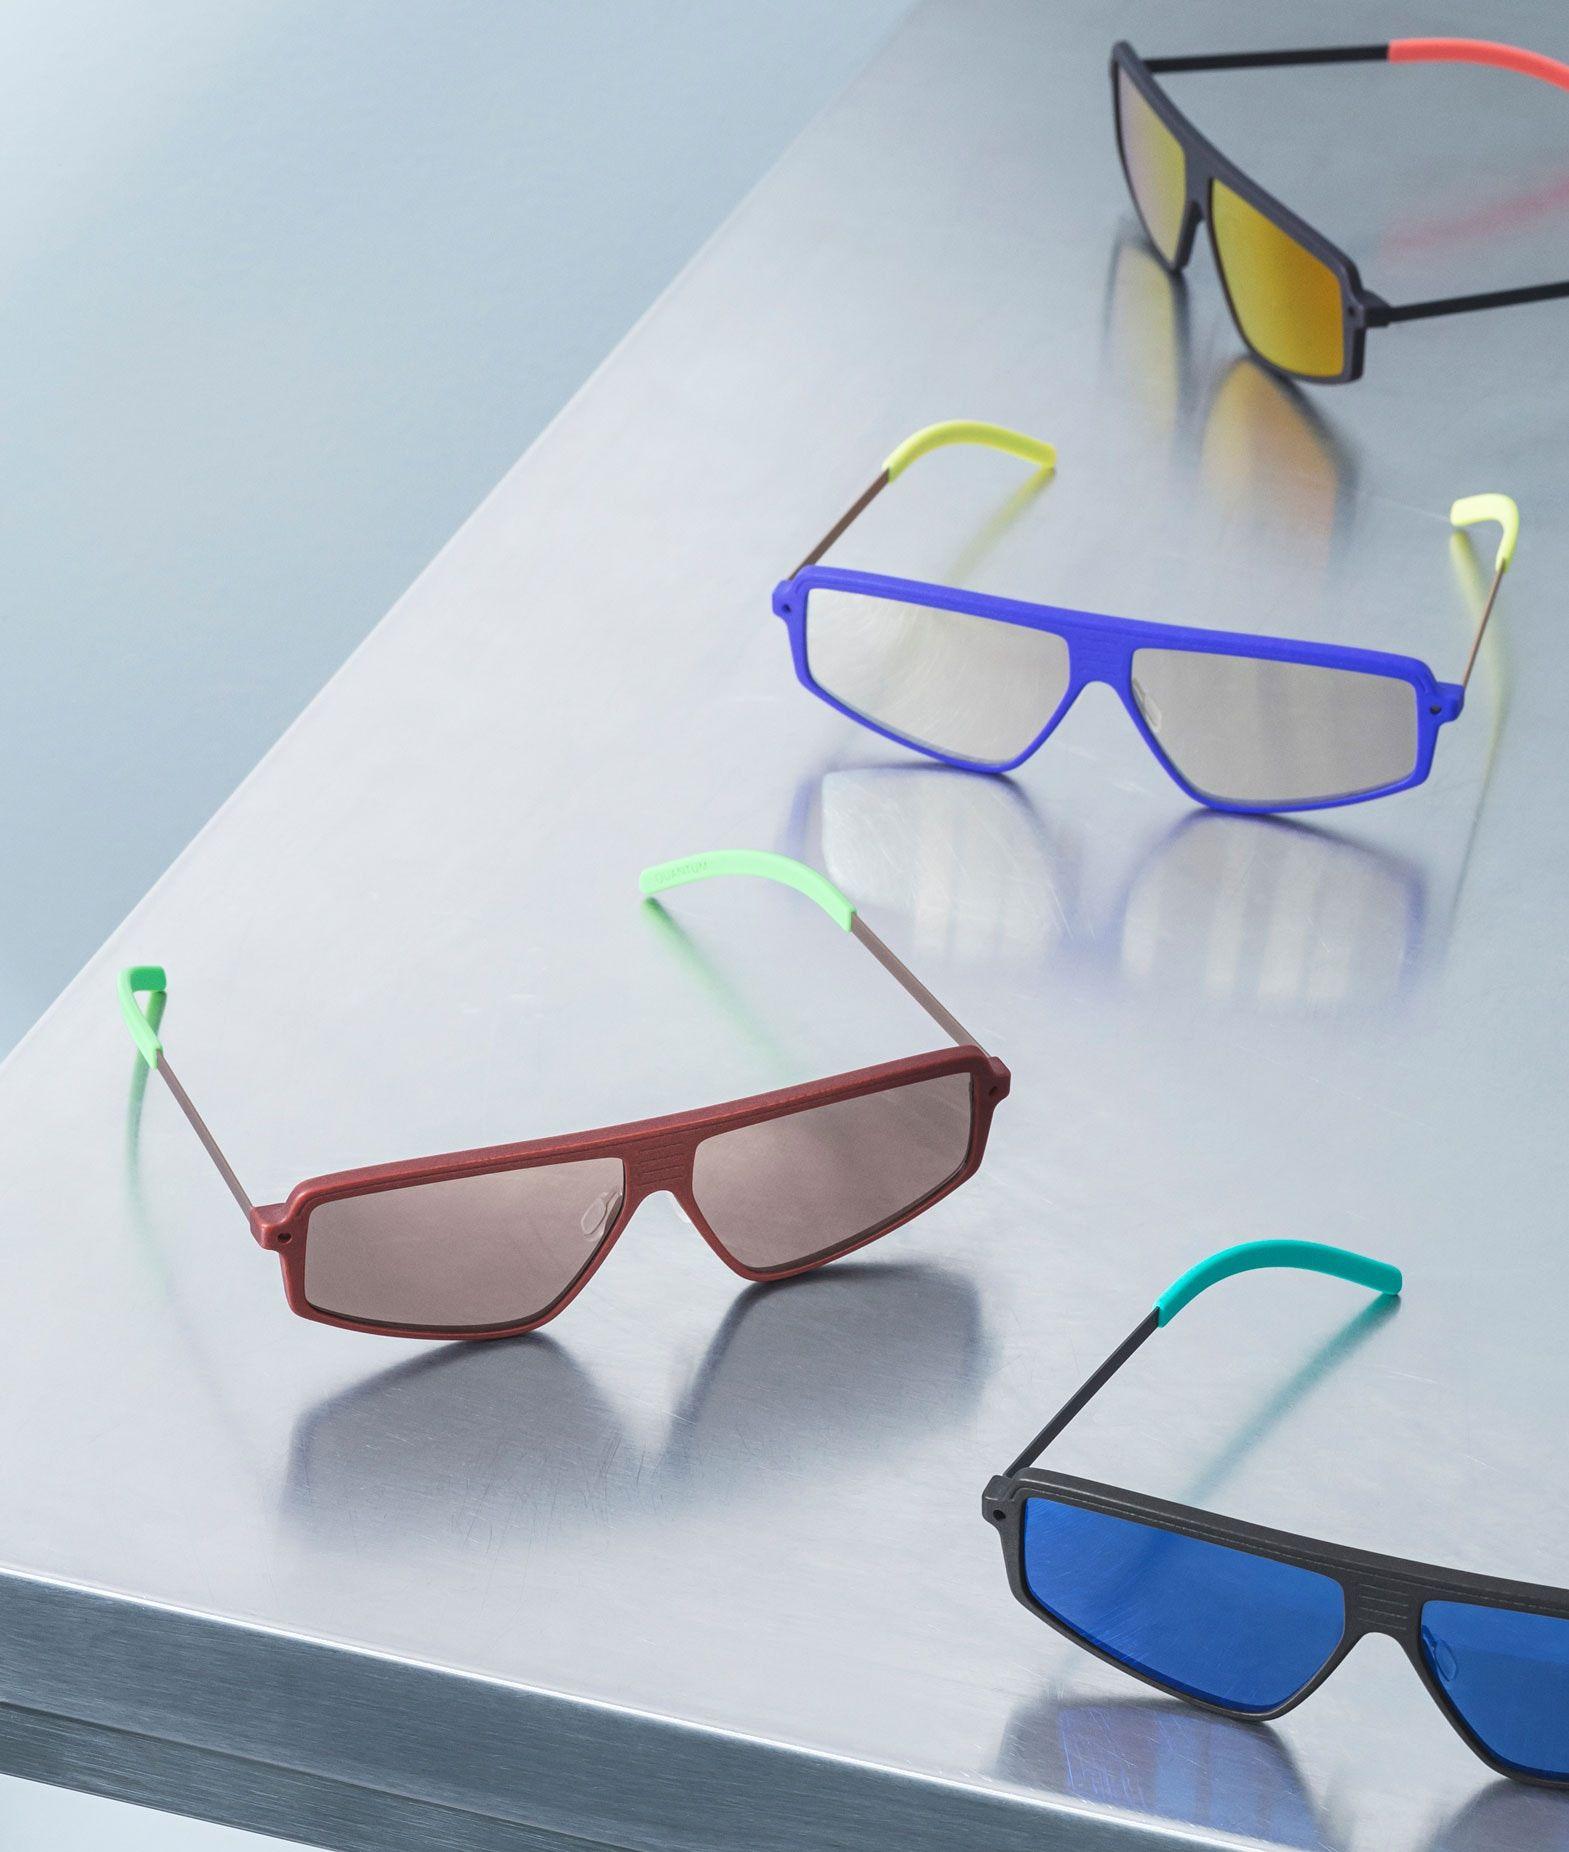 Orgreen Optics High End Danish Design Eyewear Danish Design Optical Eyewear